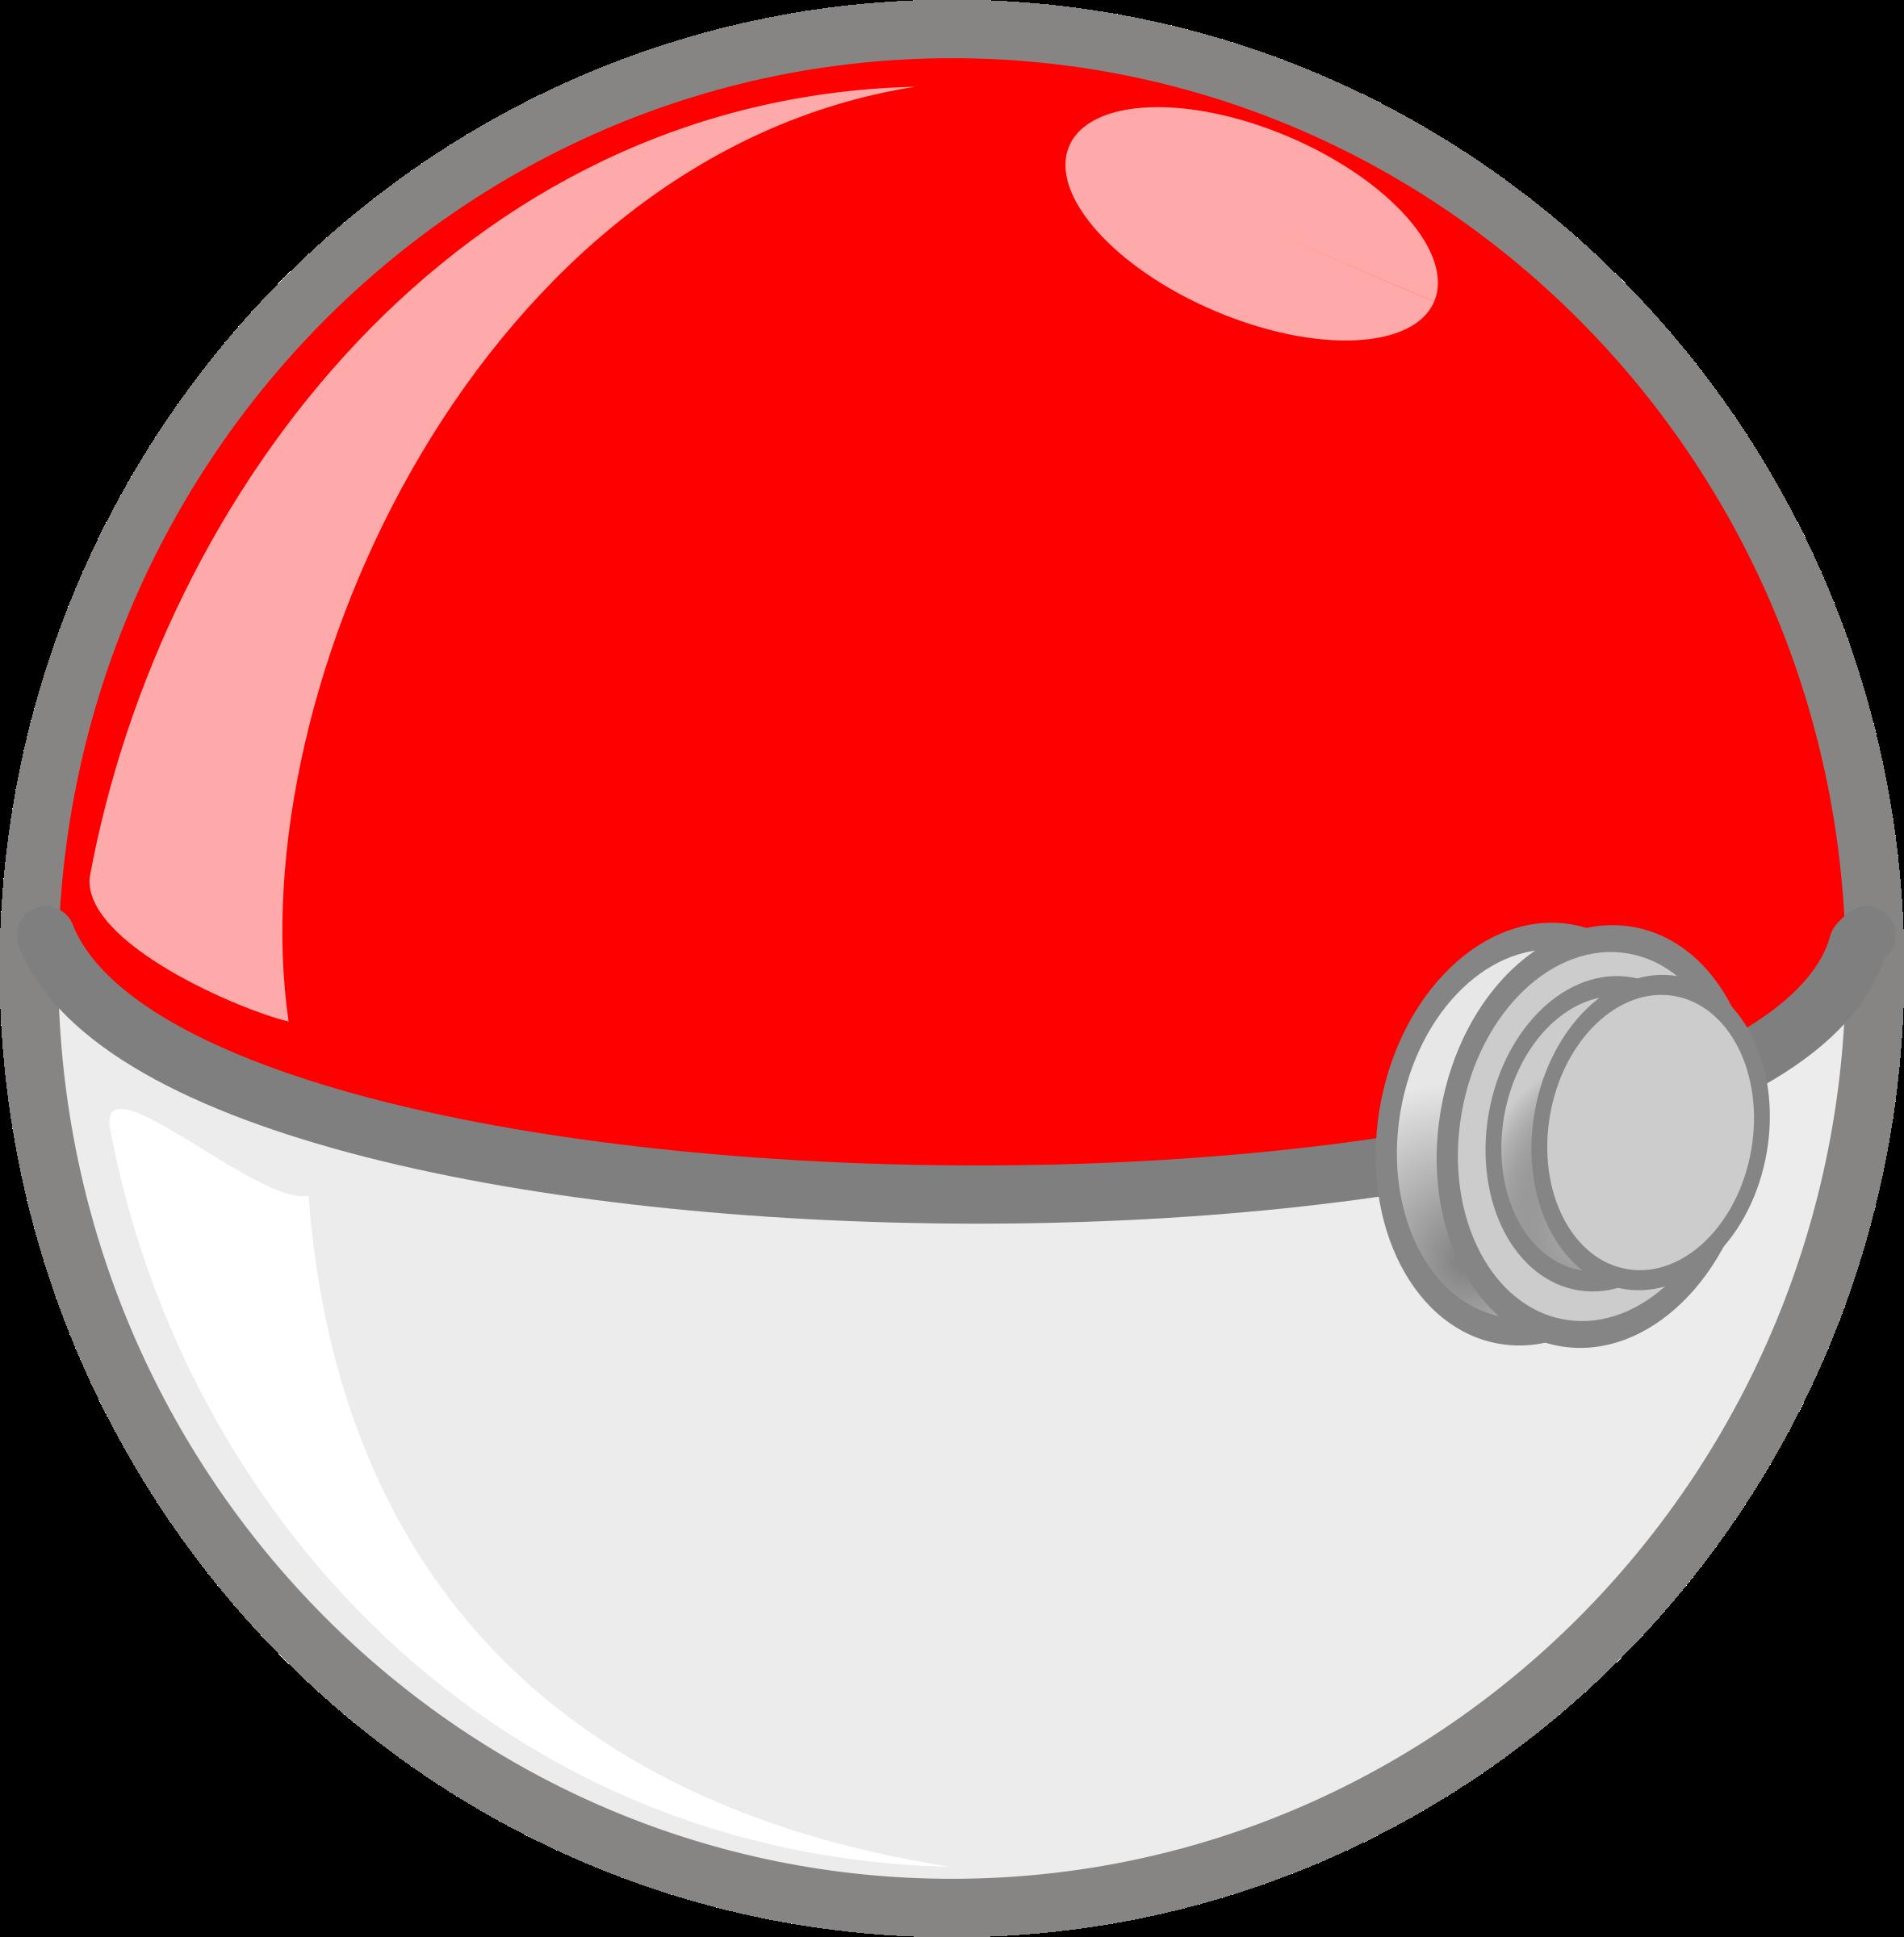 jpg royalty free library Poket ball big image. Pokeball clipart avatar